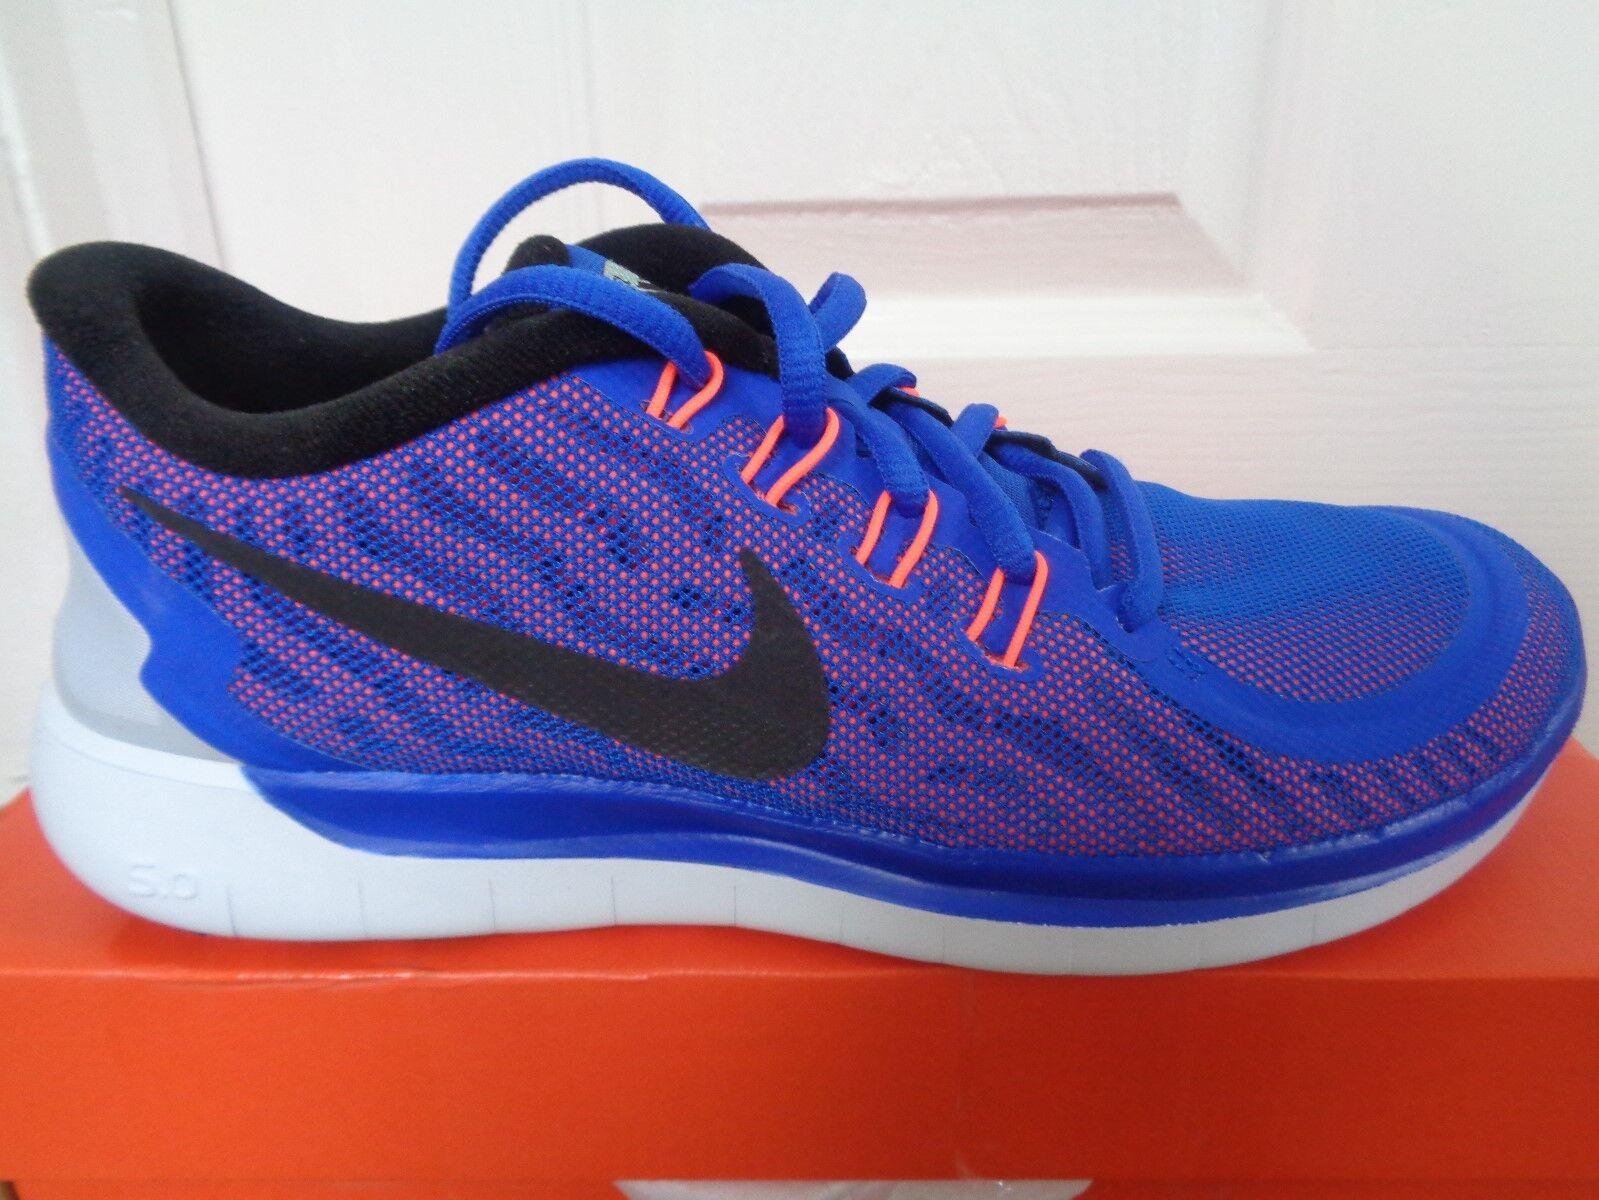 Nike Free 5.0 Flash wmns trainers sneakers 806575 400 eu 39 us 8 NEW+BOX